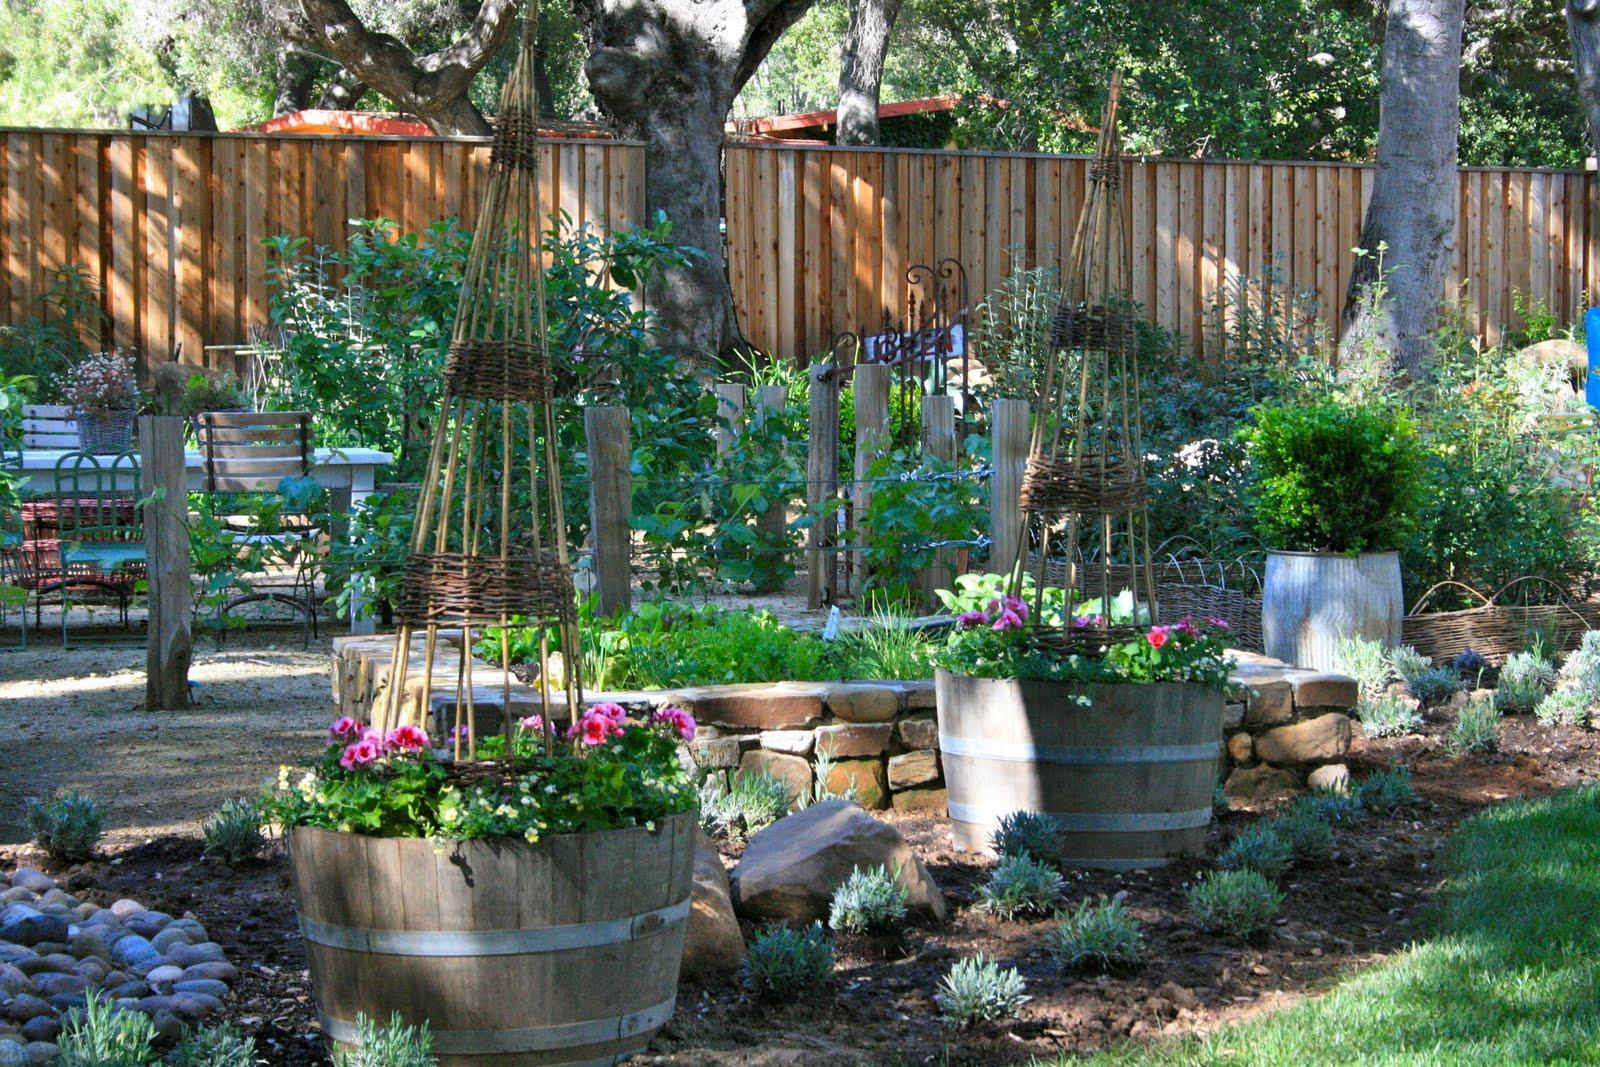 Barrel Garden Ideas | 21 Ways to Reuse A Barrel On Your Homestead